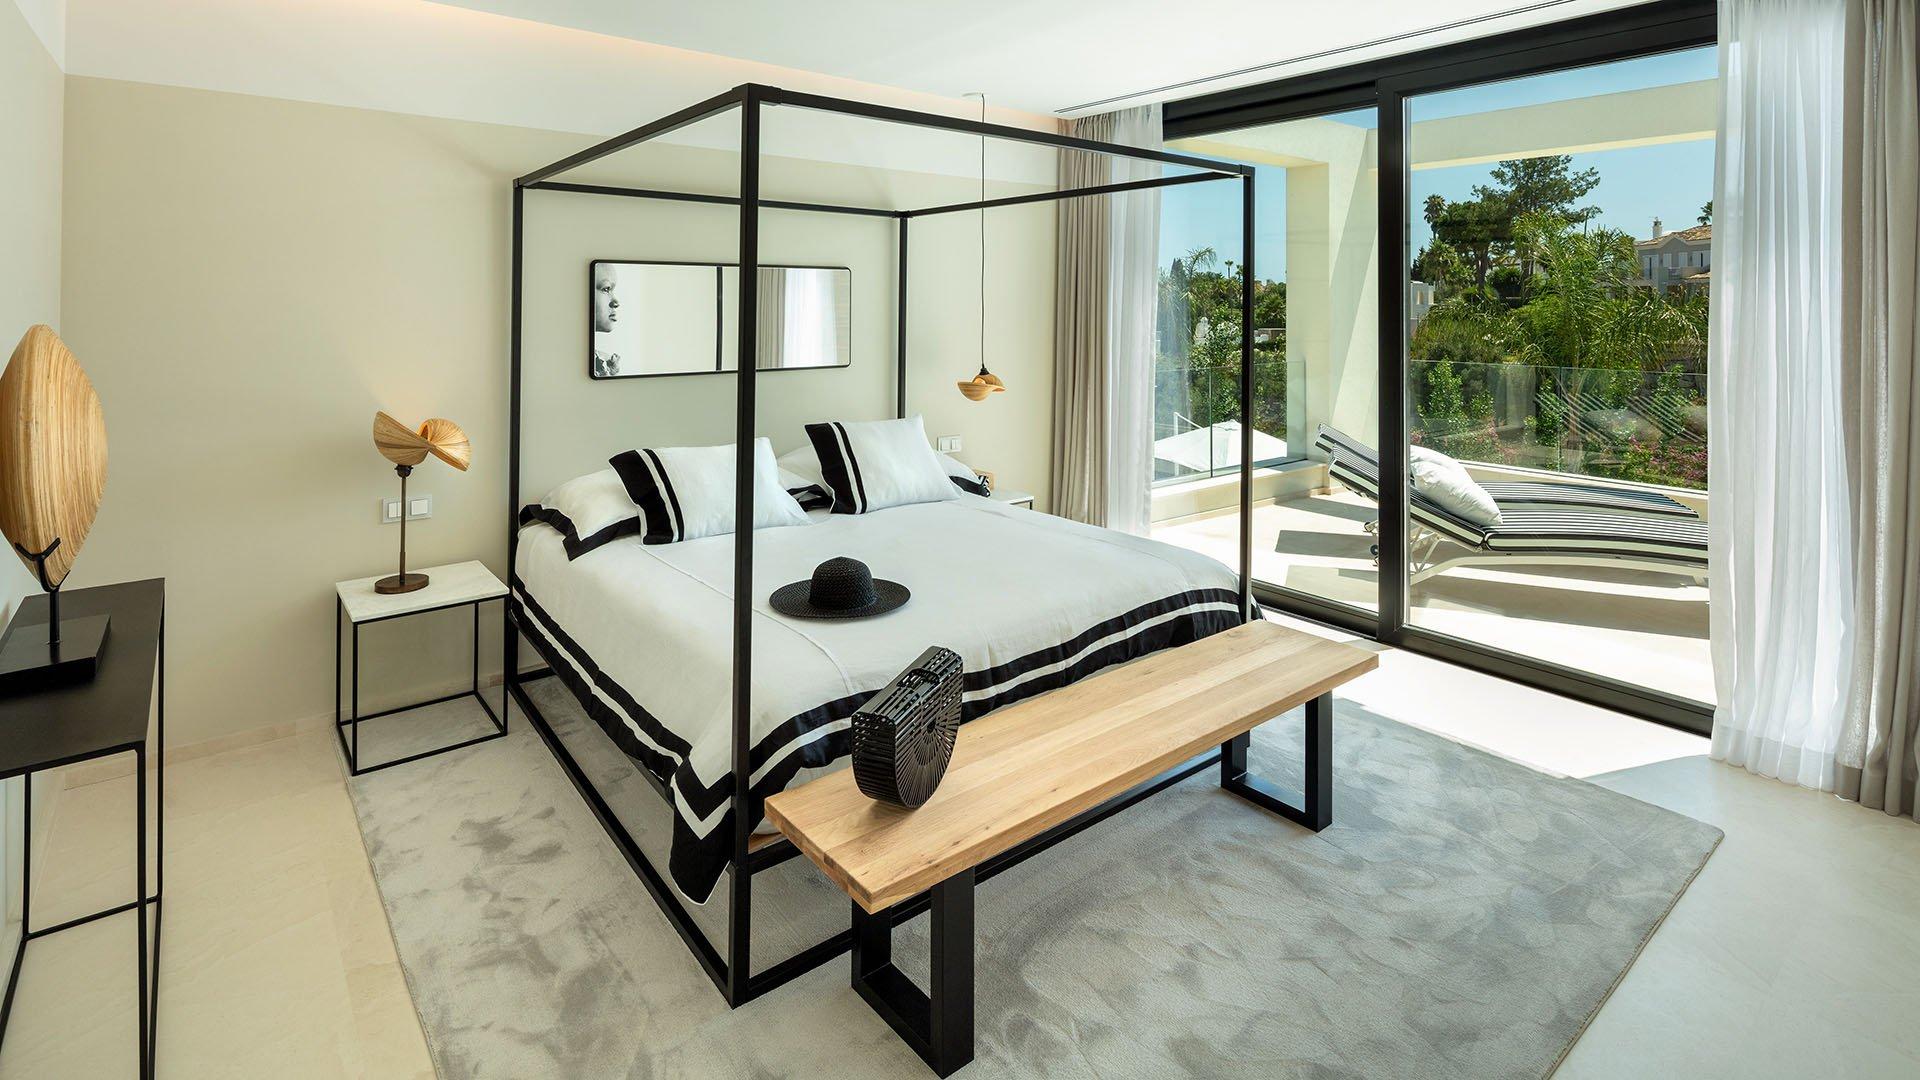 La Cerquilla 21B: Newly built villa in the heart of the Golf Valley in Marbella